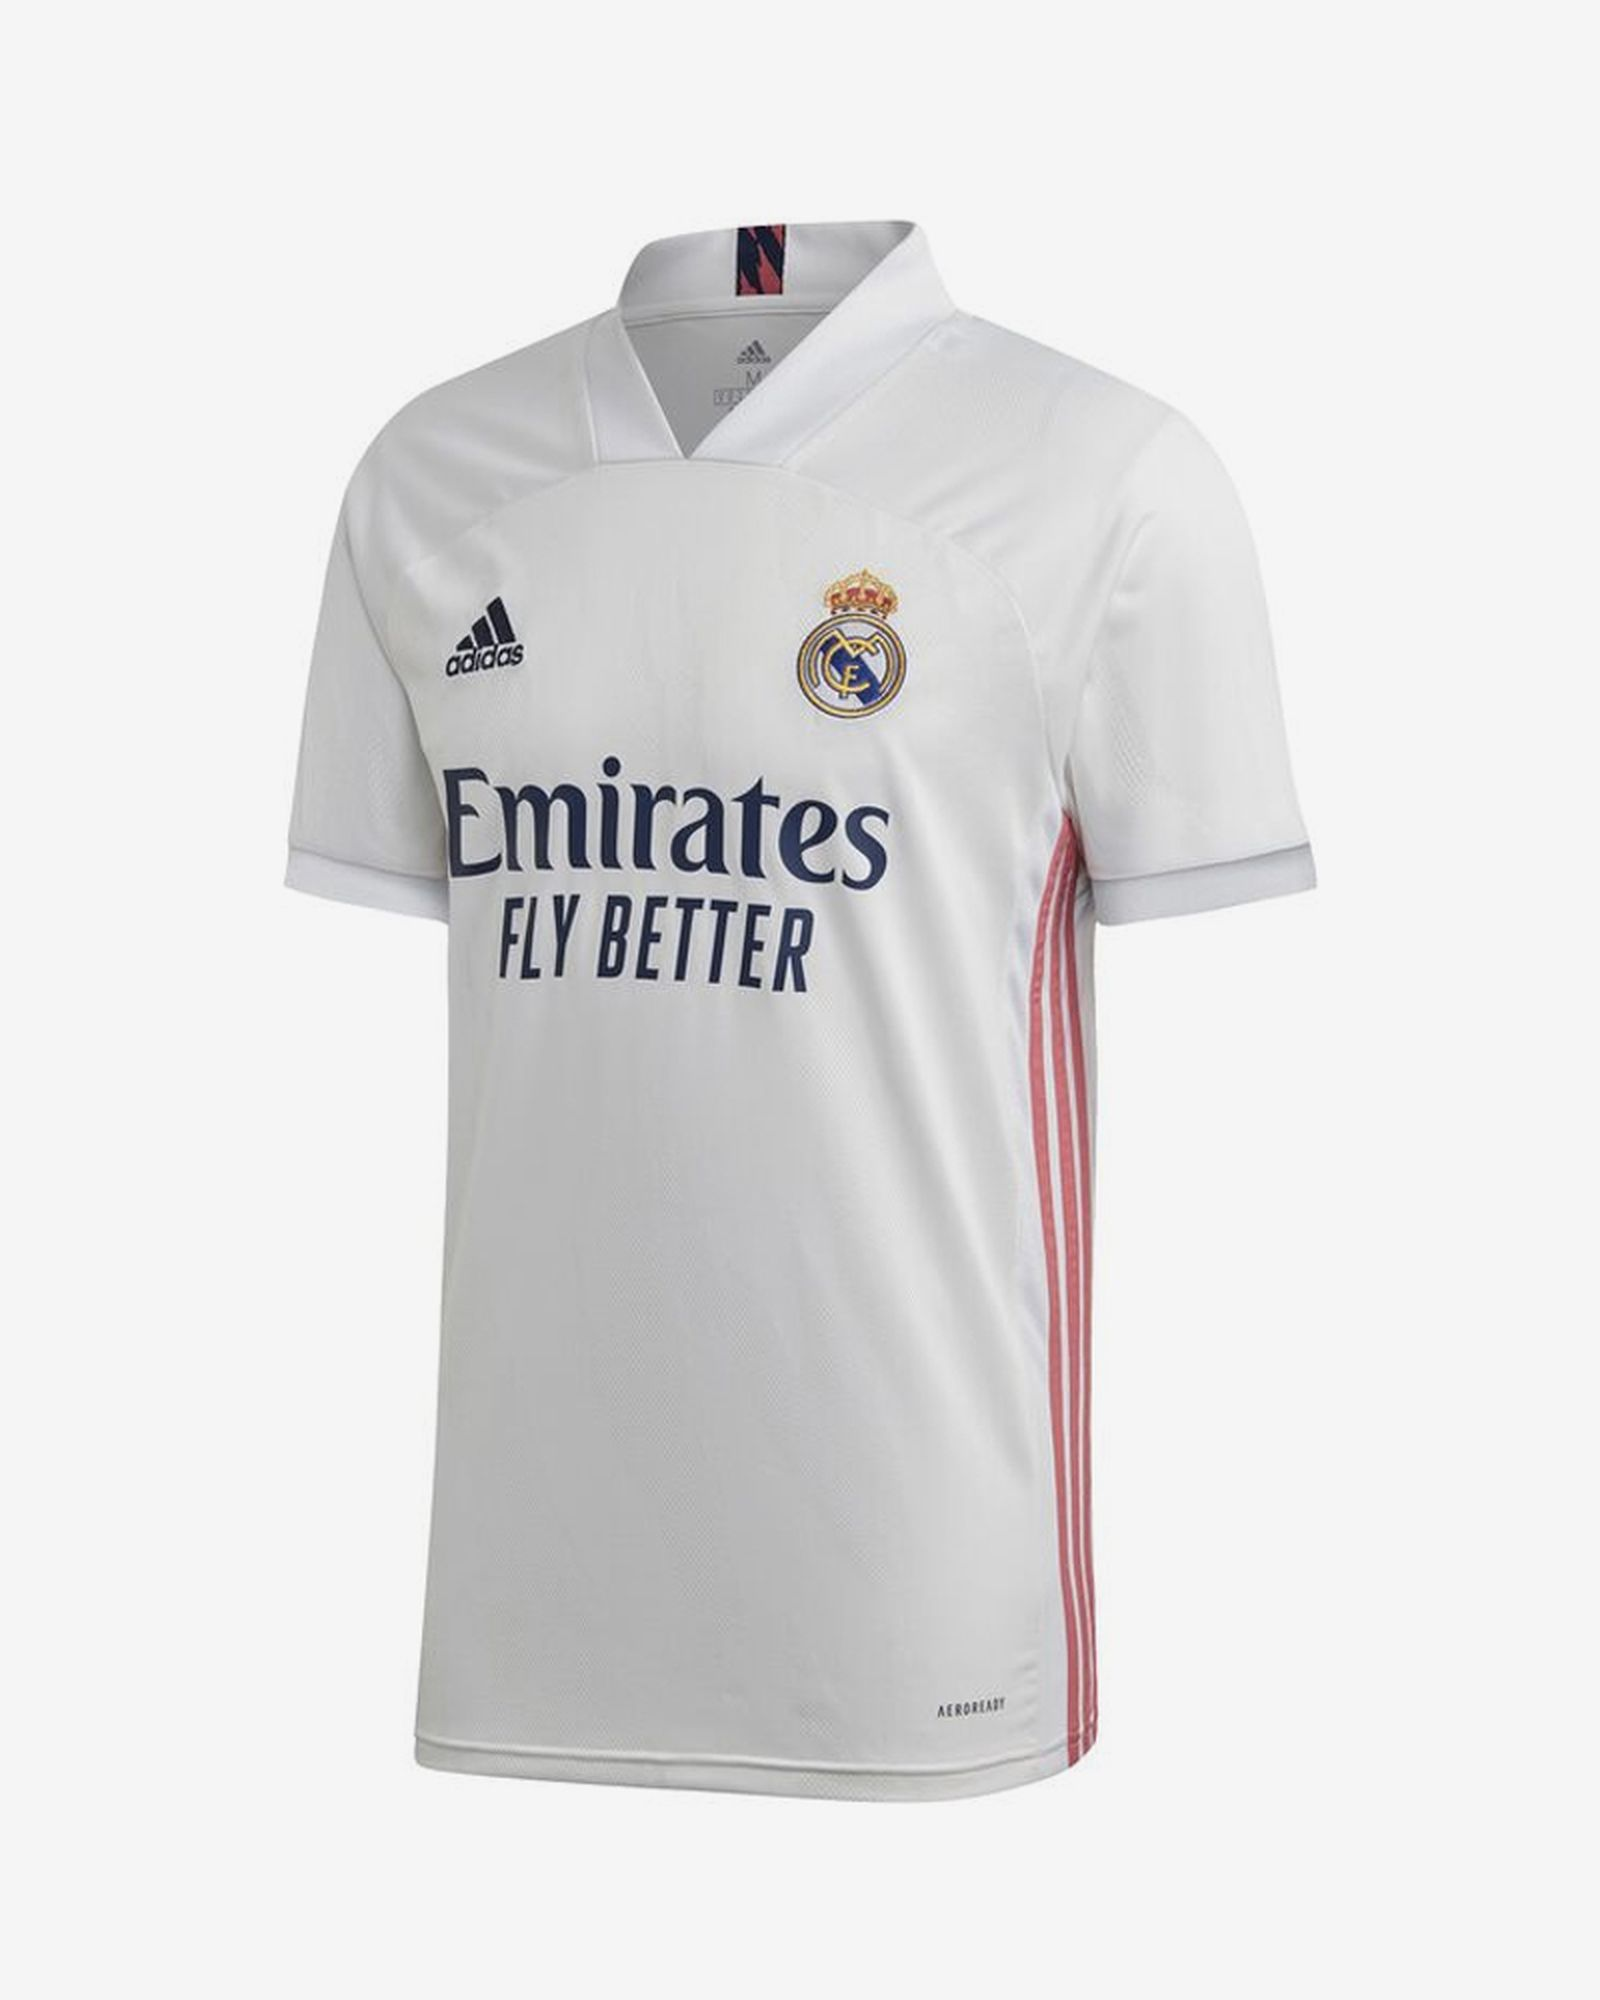 football-shirts-2020-review-11